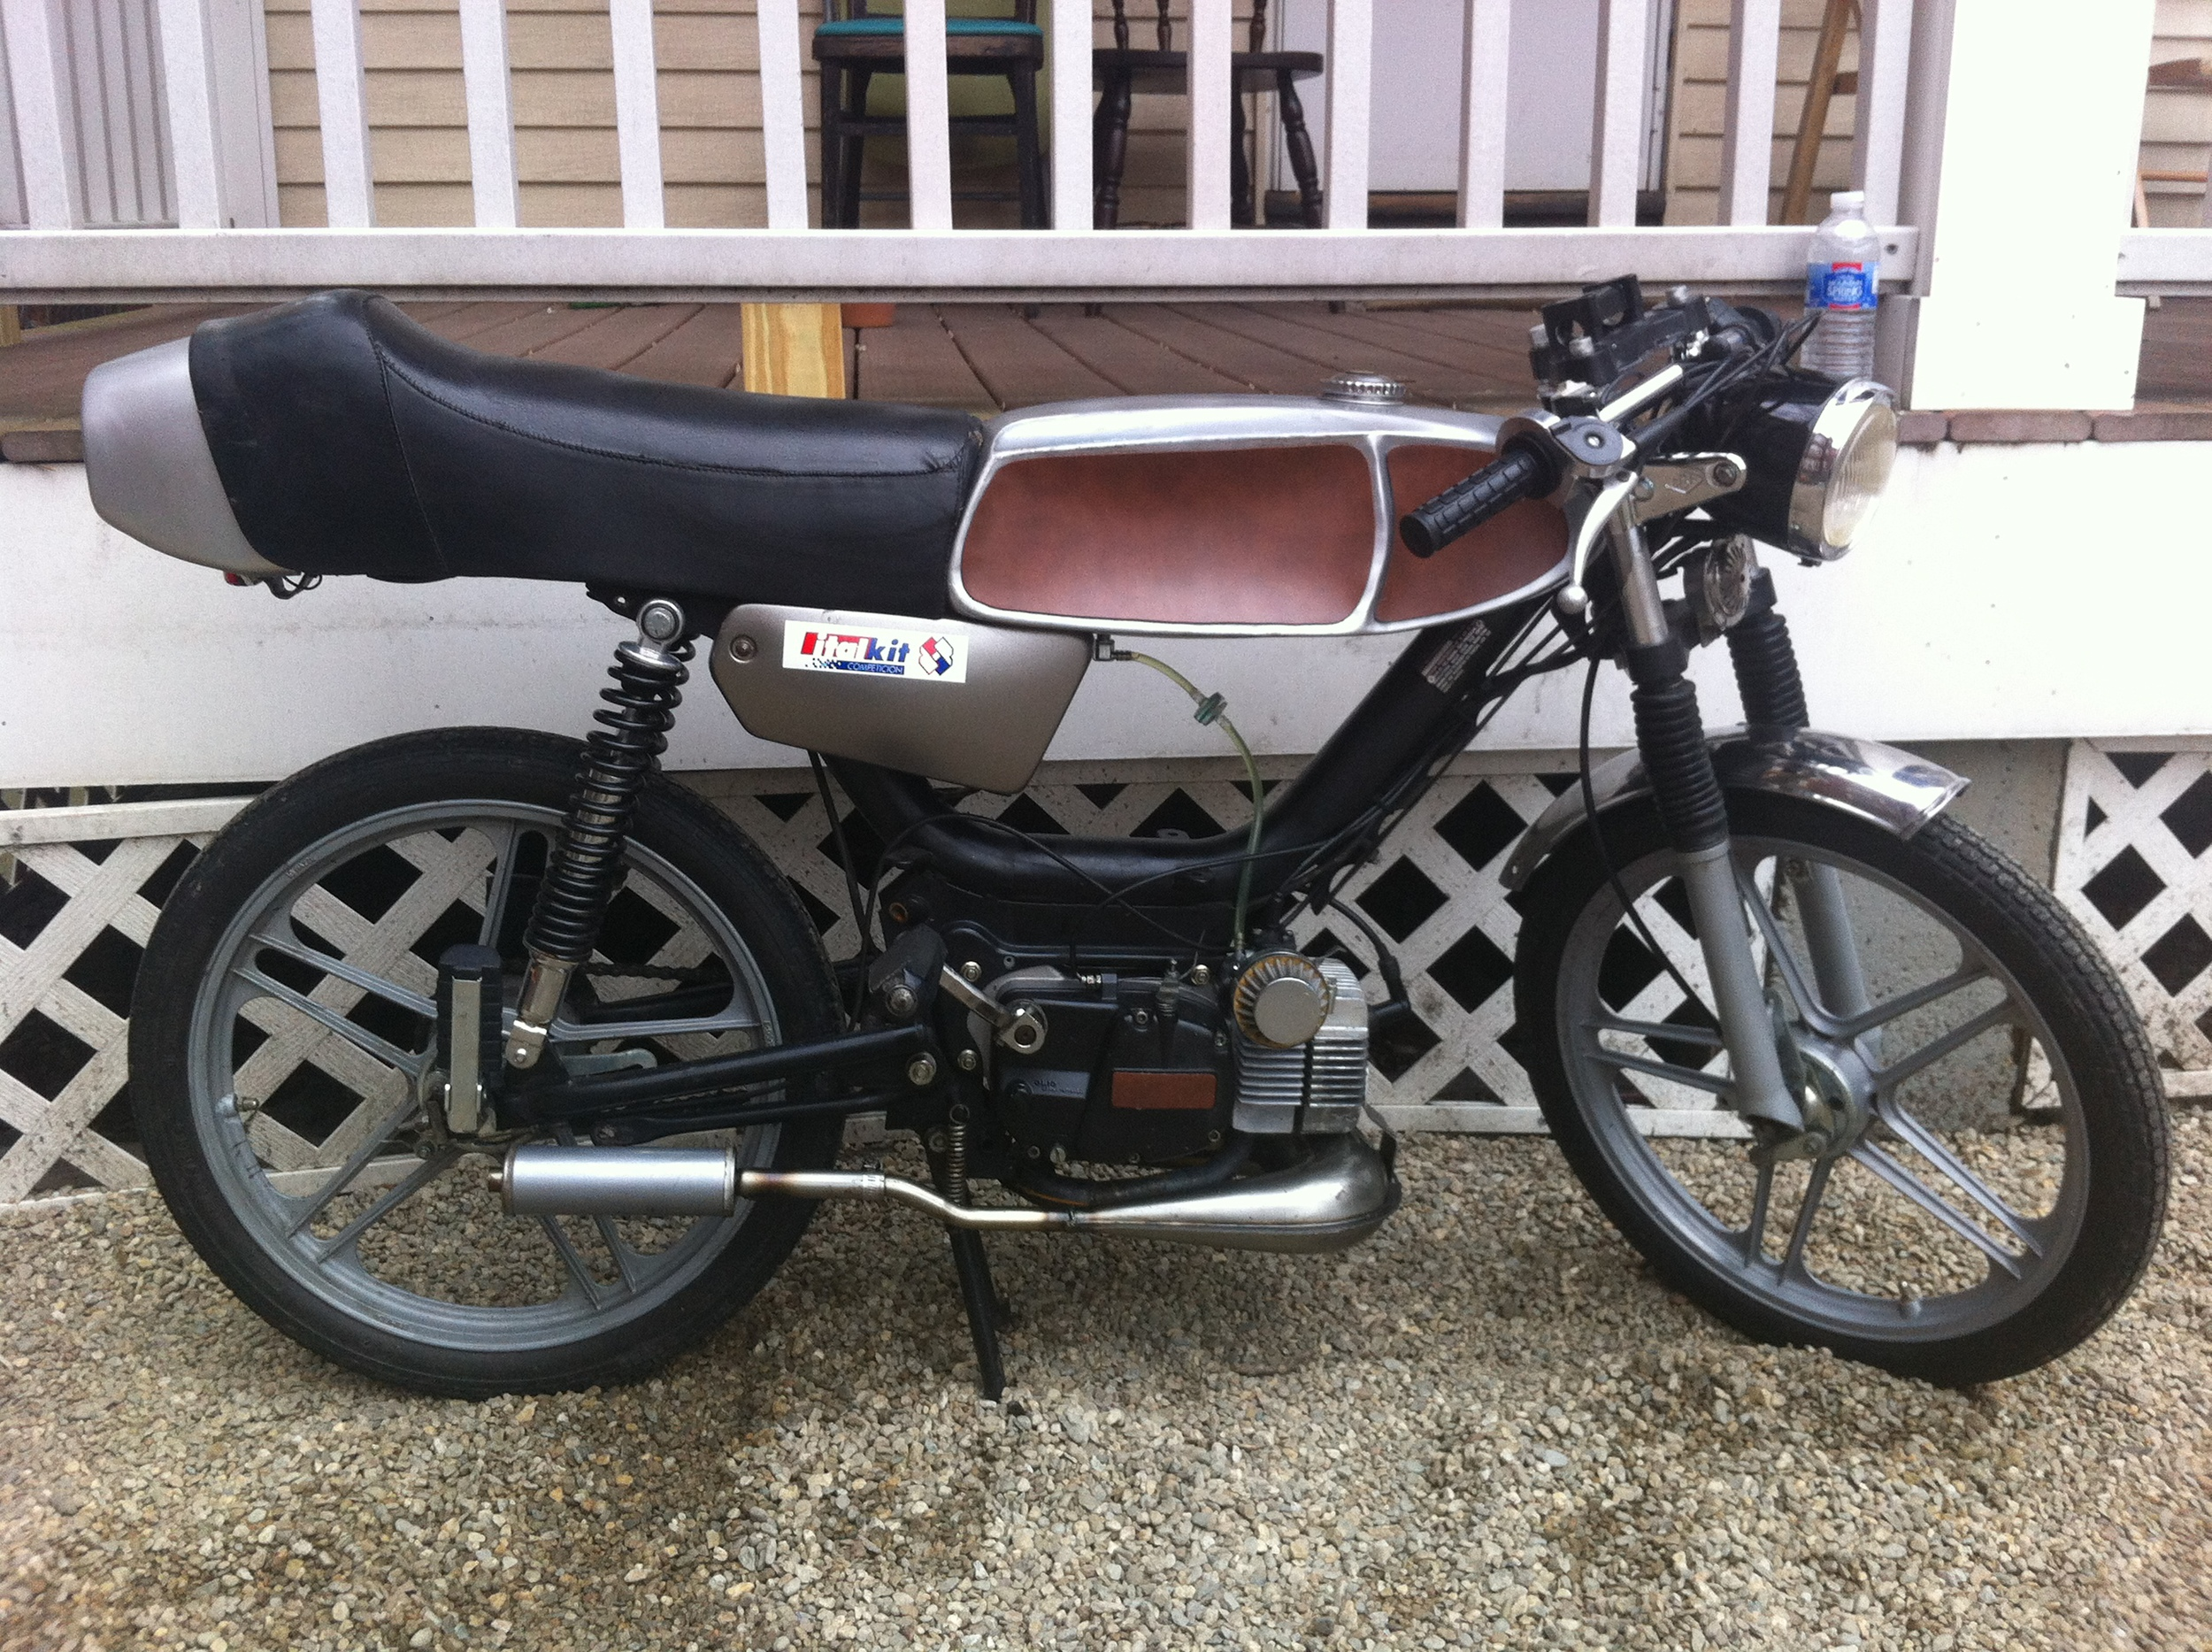 1985 Motomarina Sebring